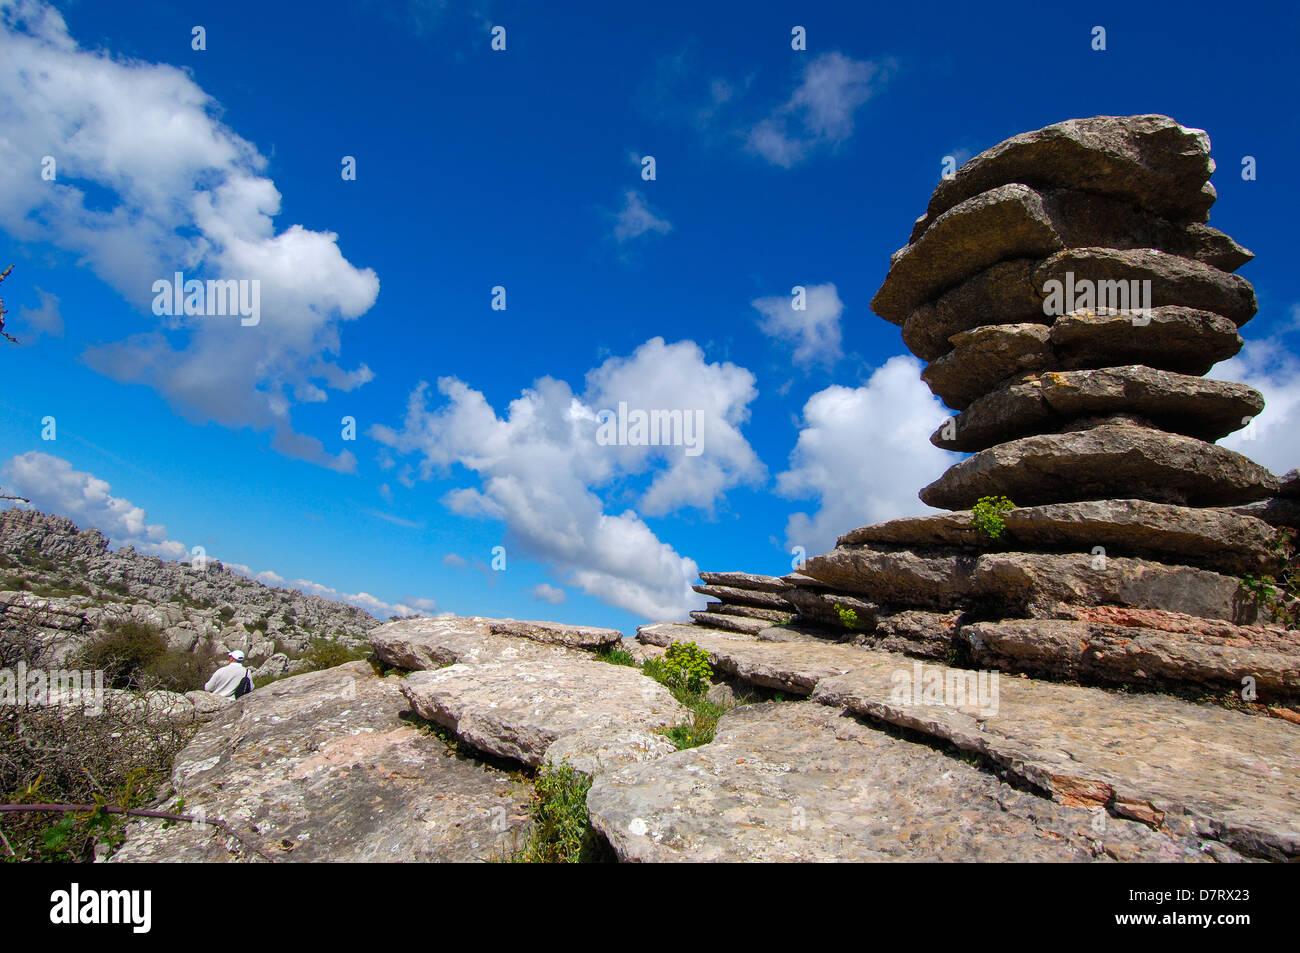 Erosion working on Jurassic limestones, Torcal de Antequera. Malaga province, Andalusia, Spain - Stock Image